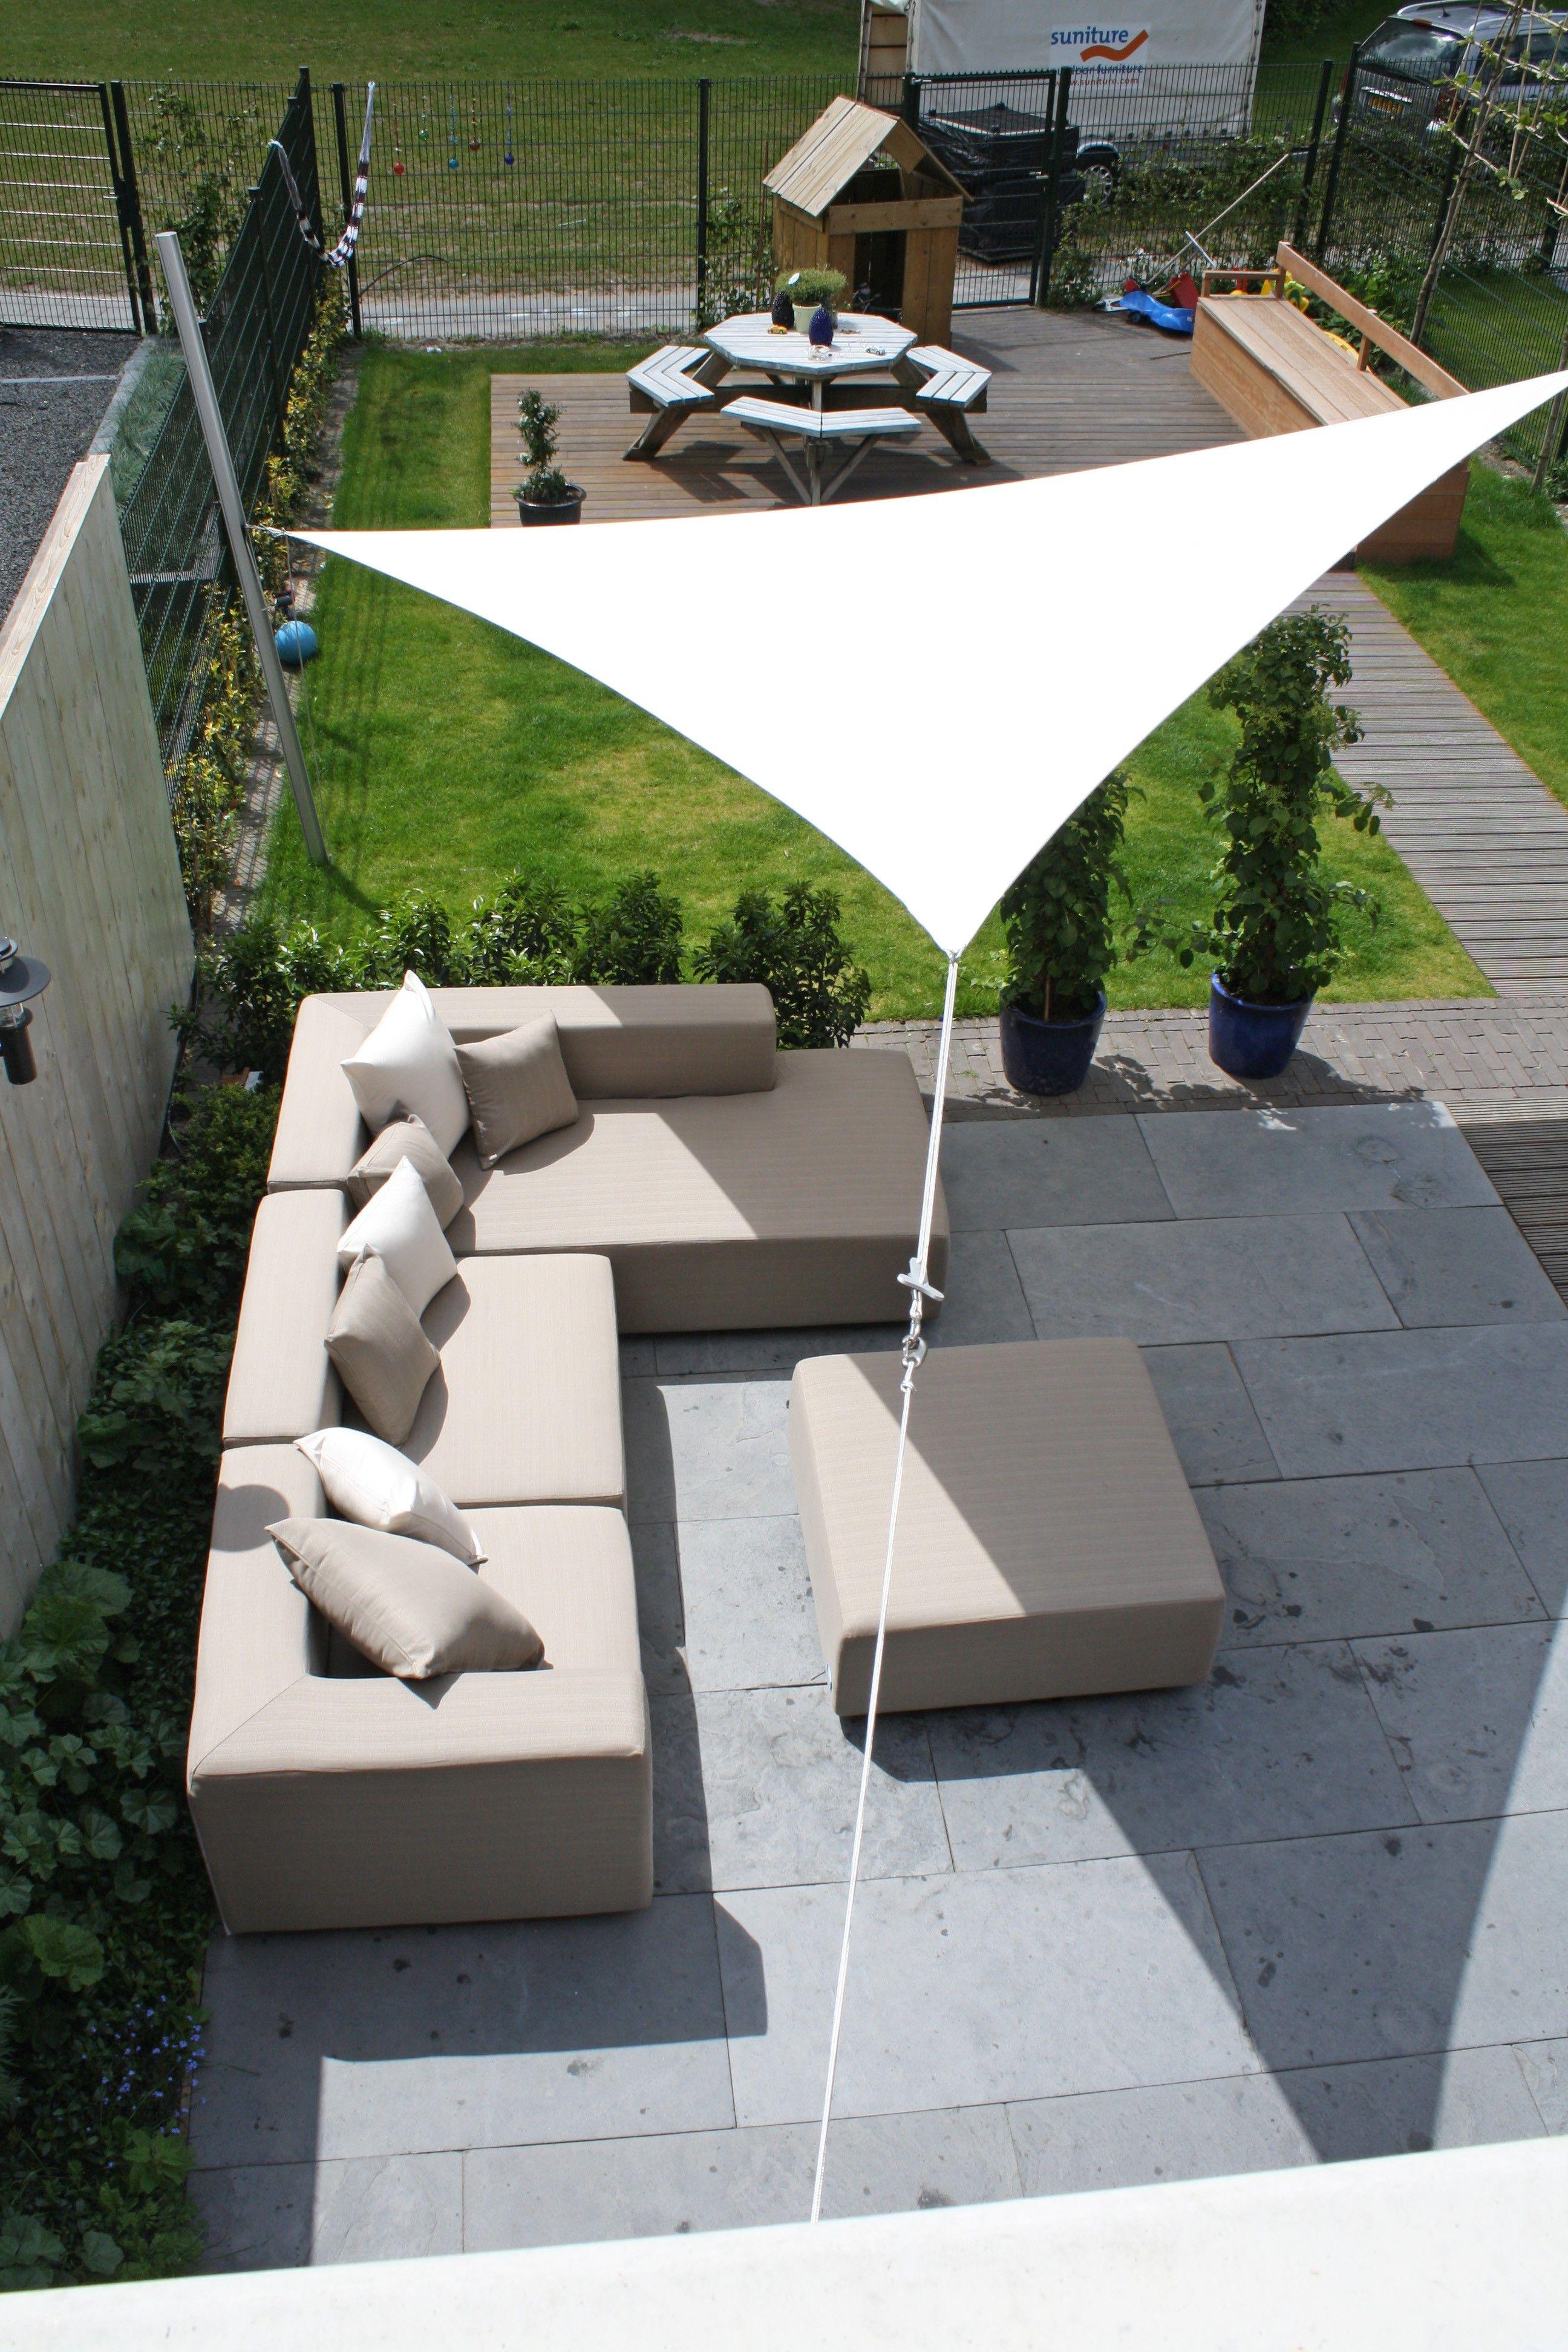 ingenua sonnensegel dreieck solo oder komplett set garten canopy shade canopy und. Black Bedroom Furniture Sets. Home Design Ideas